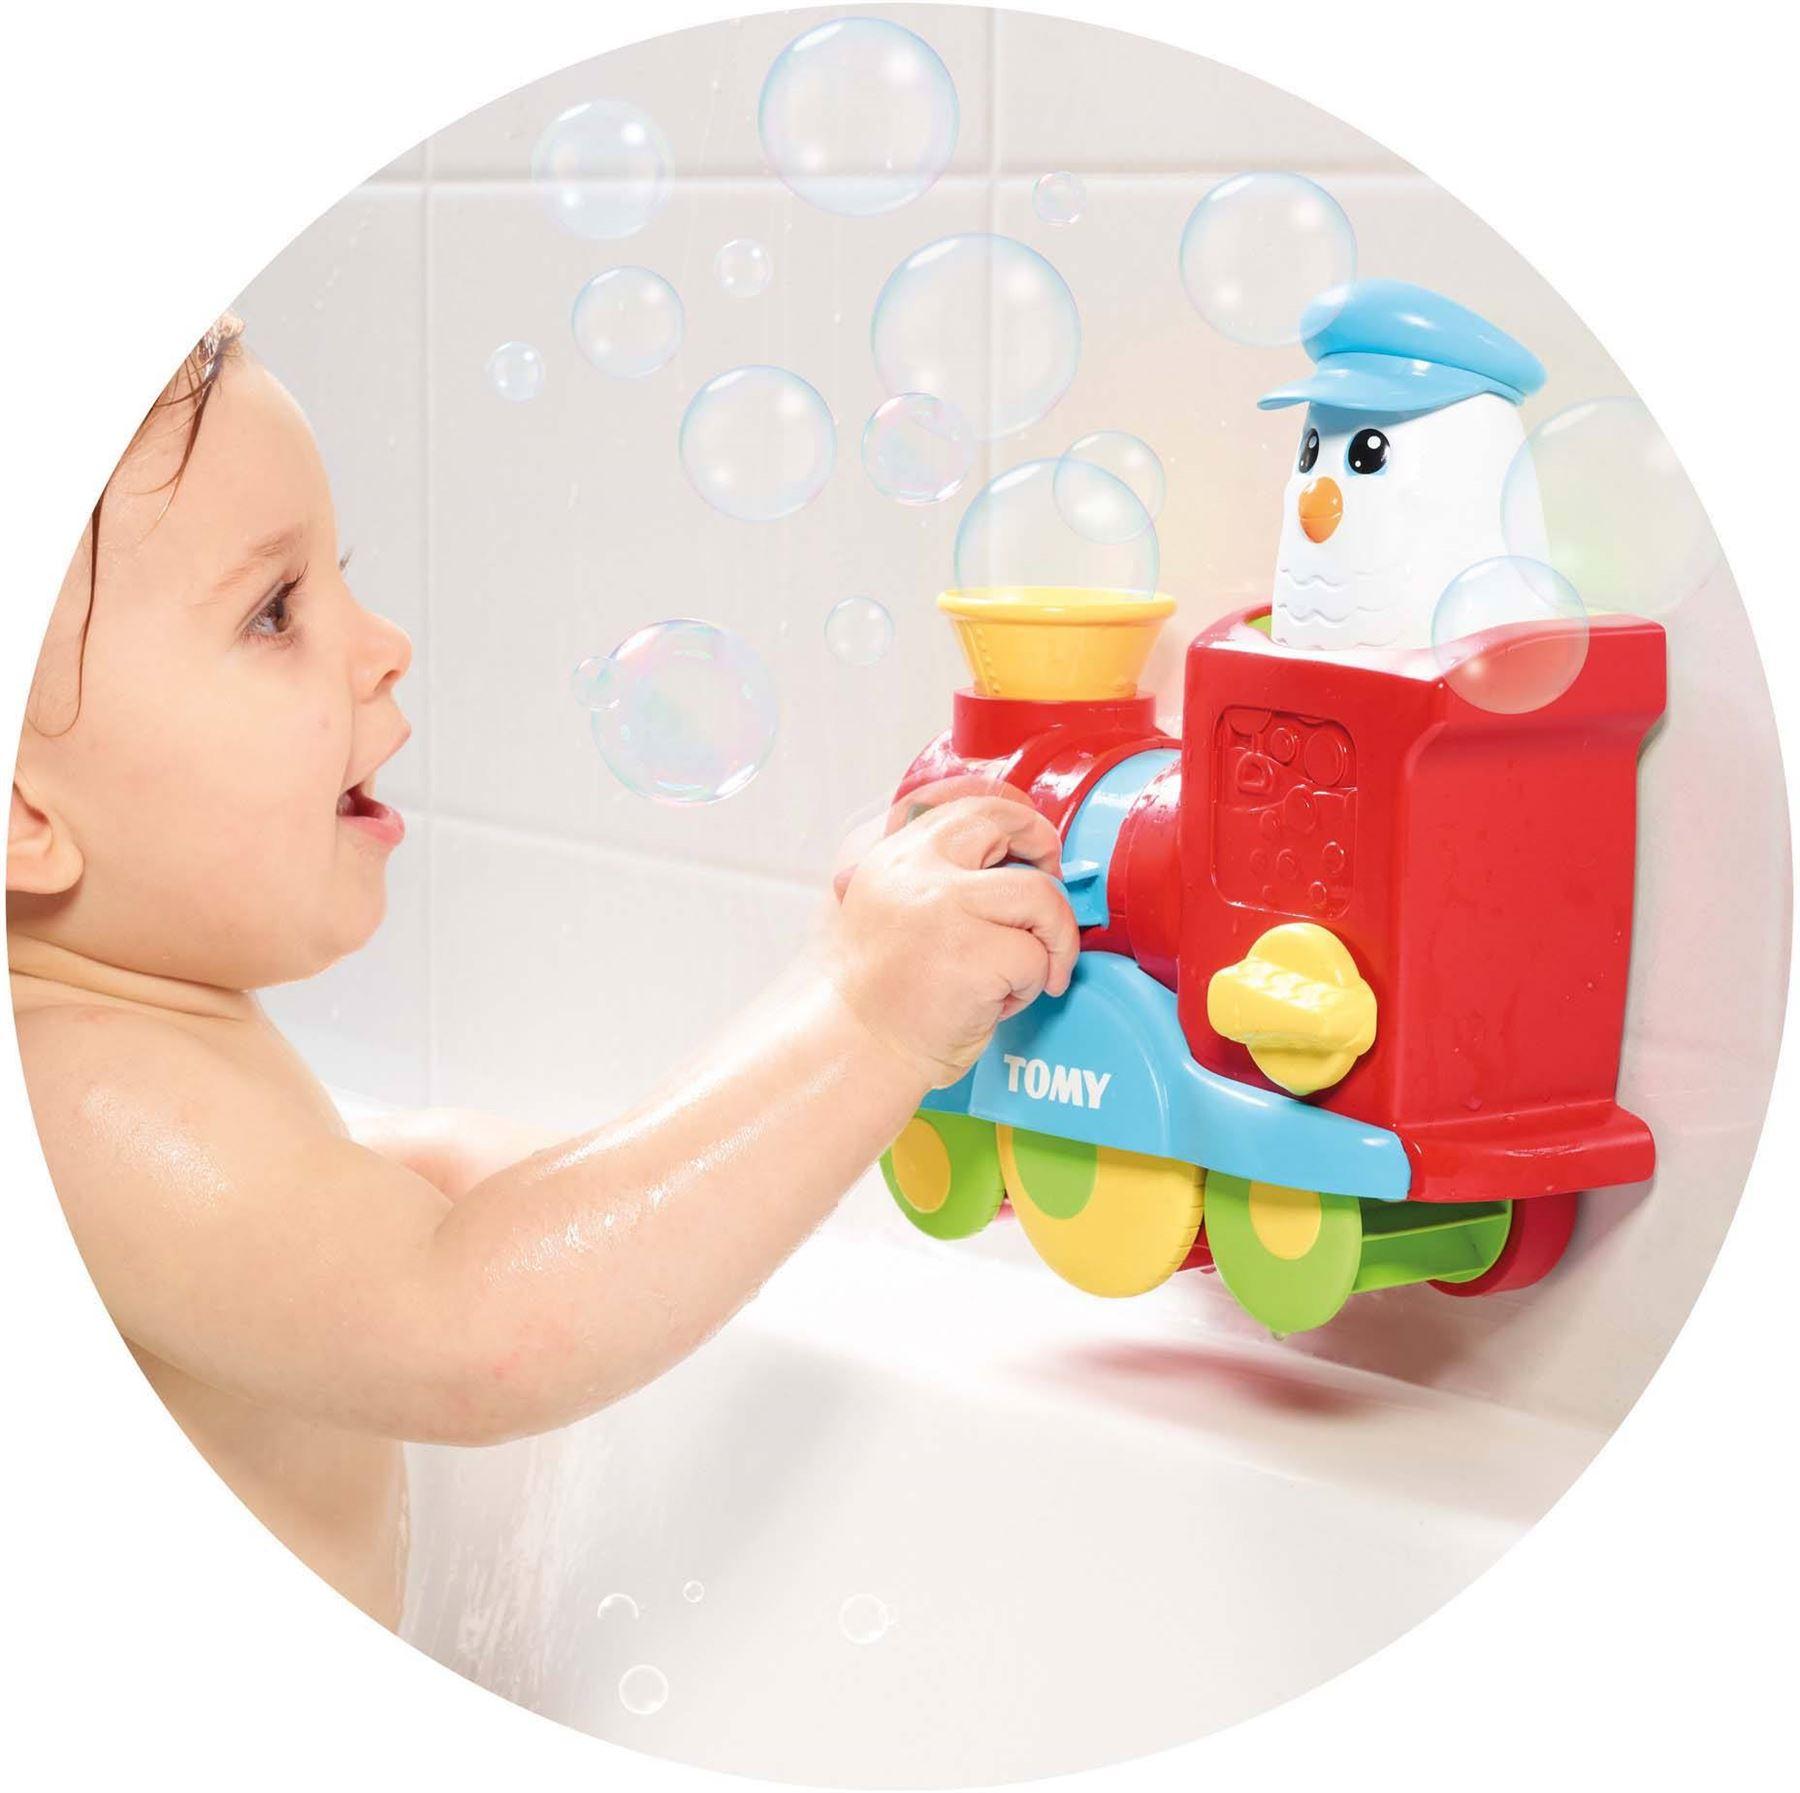 Tomy BUBBLE BLAST TRAIN Fun Bath Toy Toddler Spin Pour Scoop Splash ...